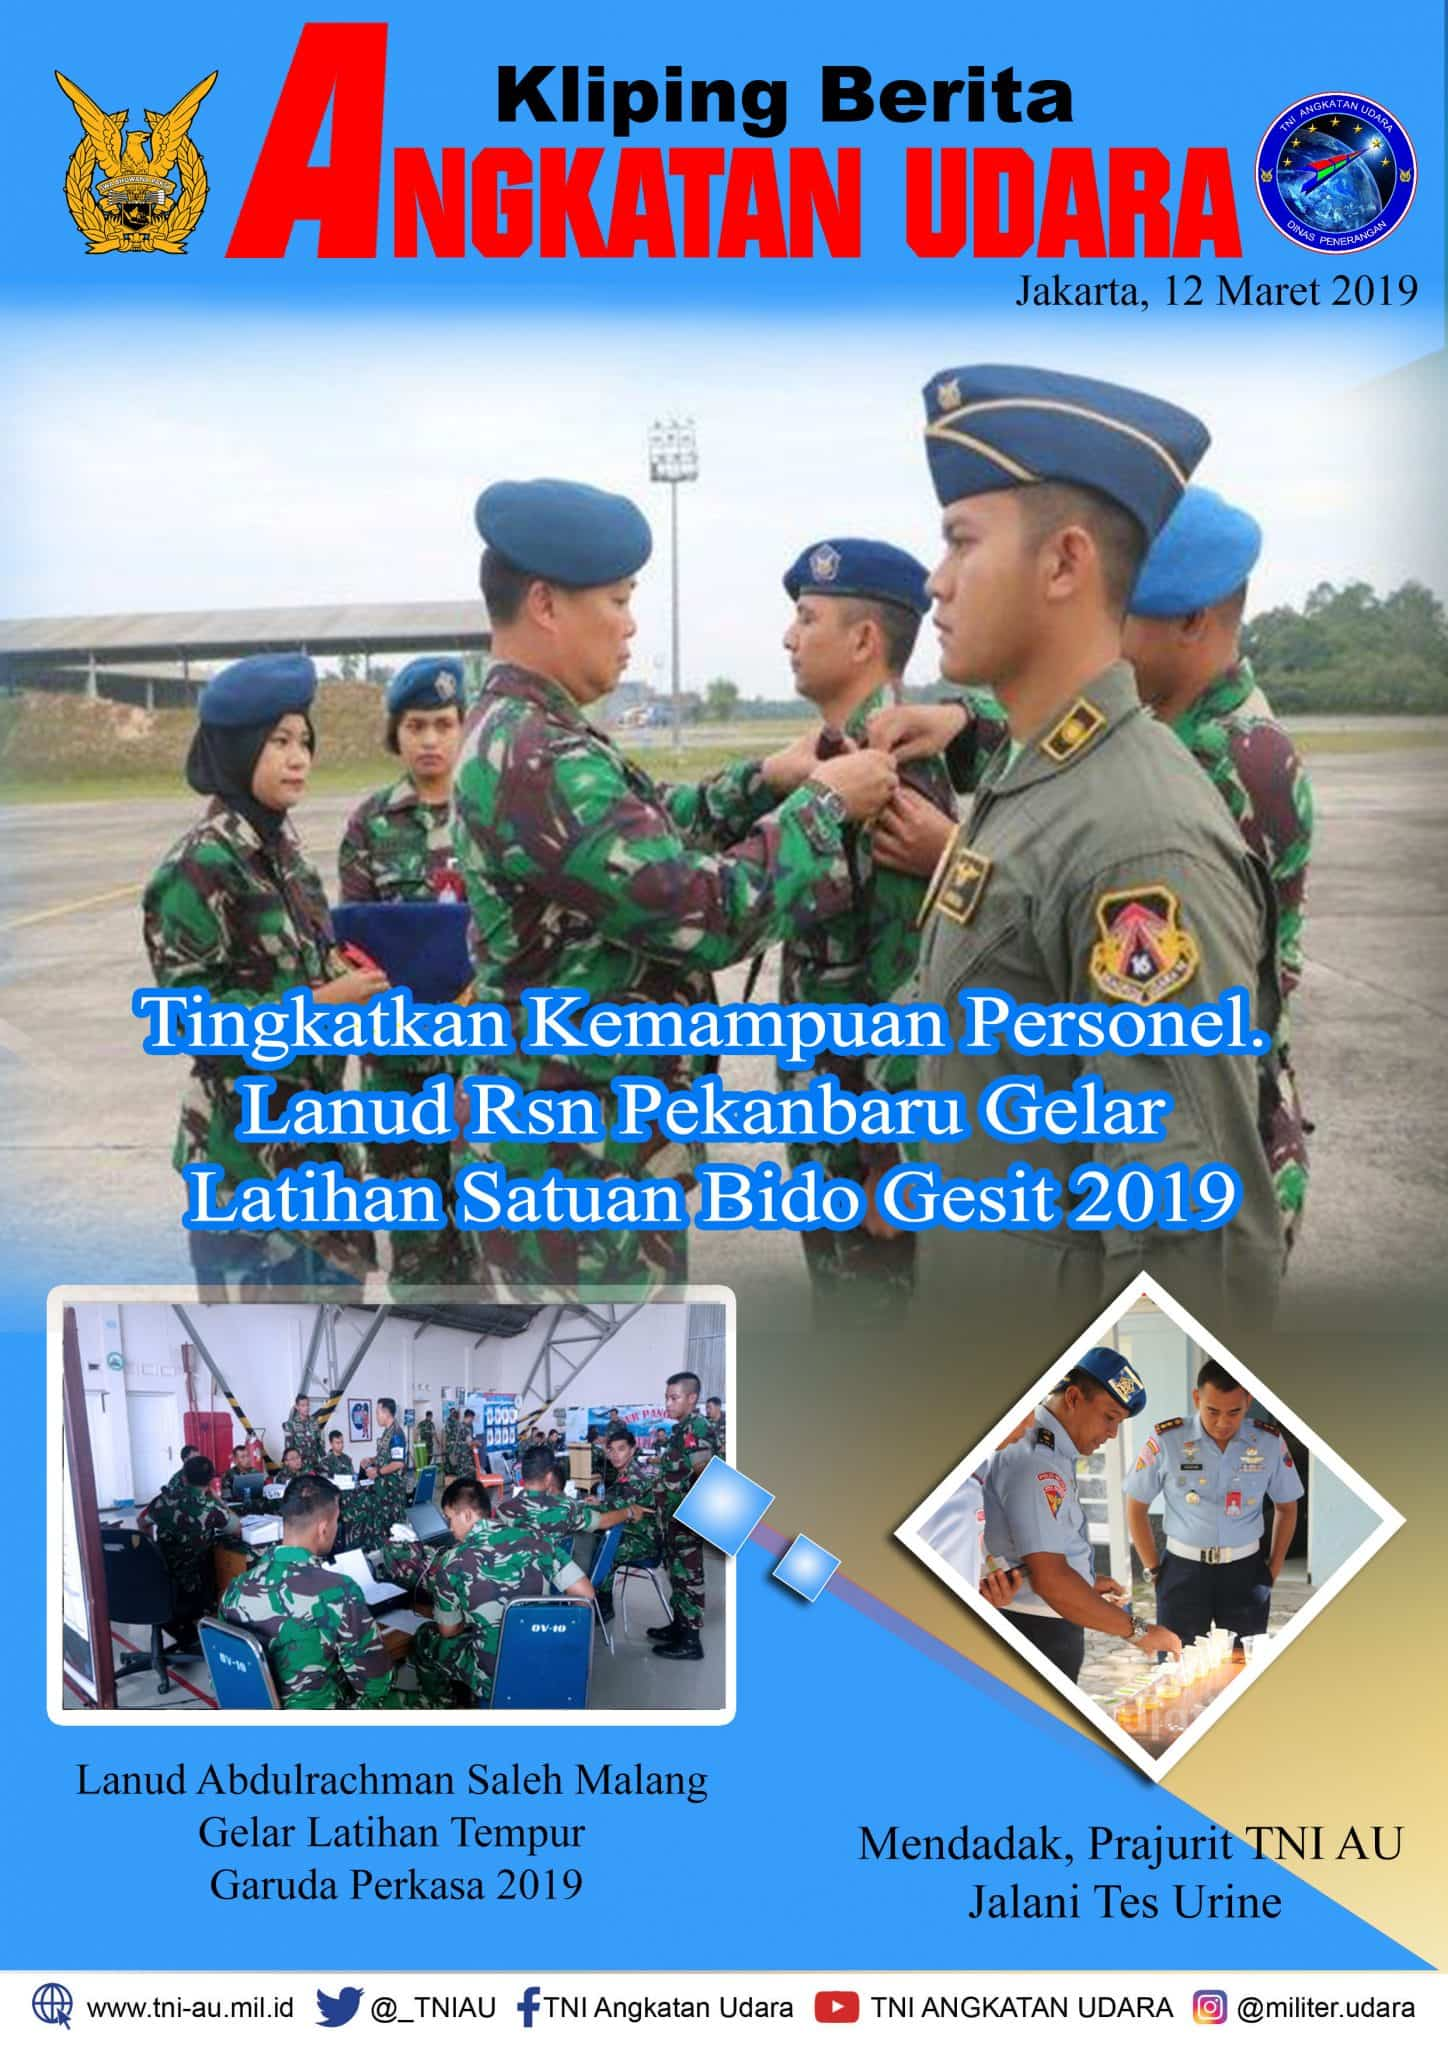 Kliping Berita Media 12 Maret 2019